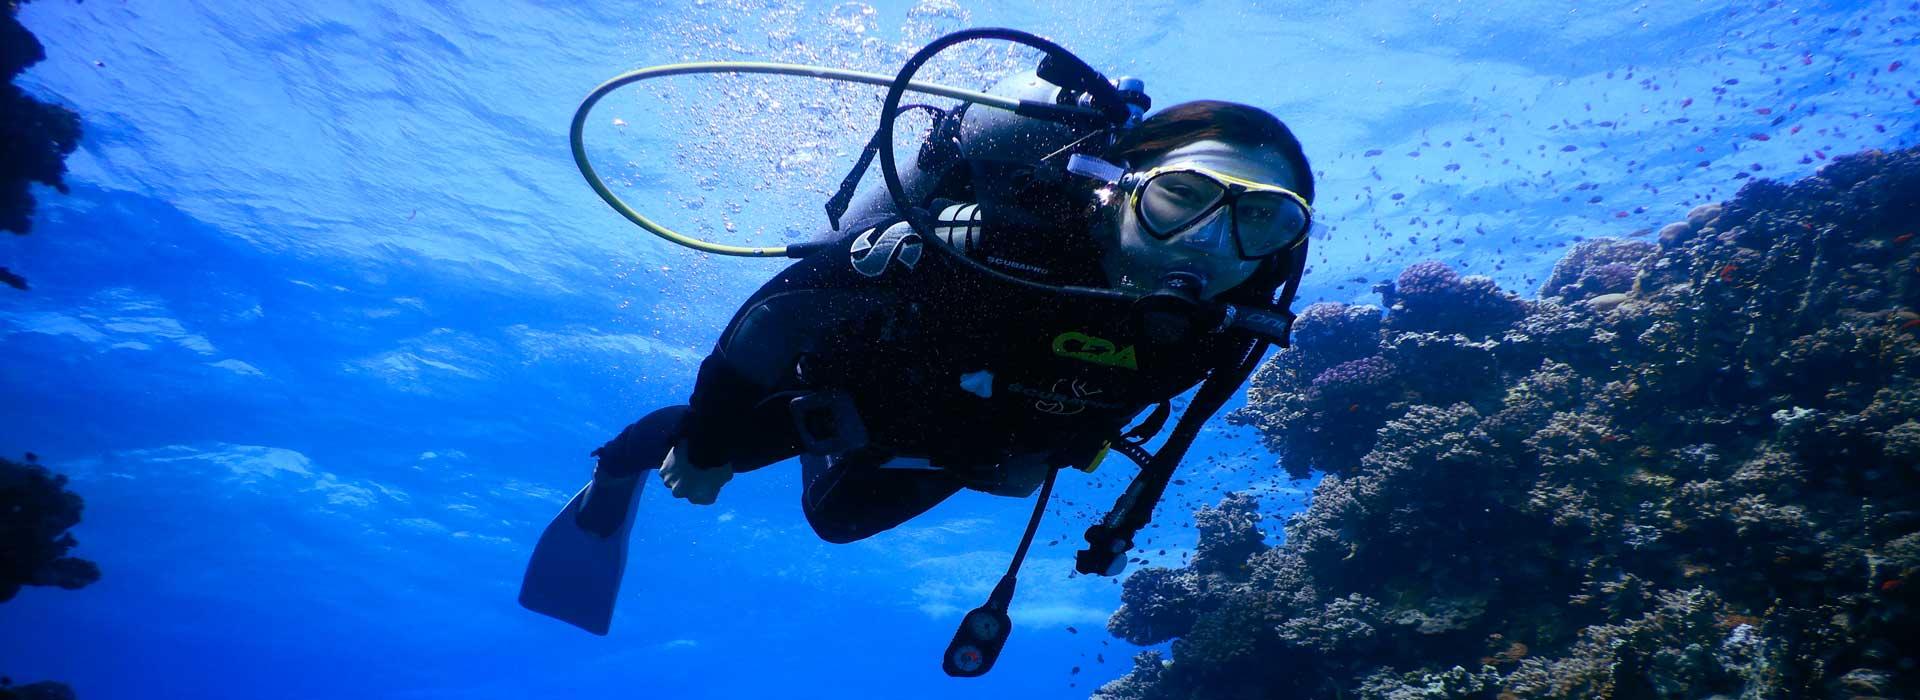 advanced-2- dive pro